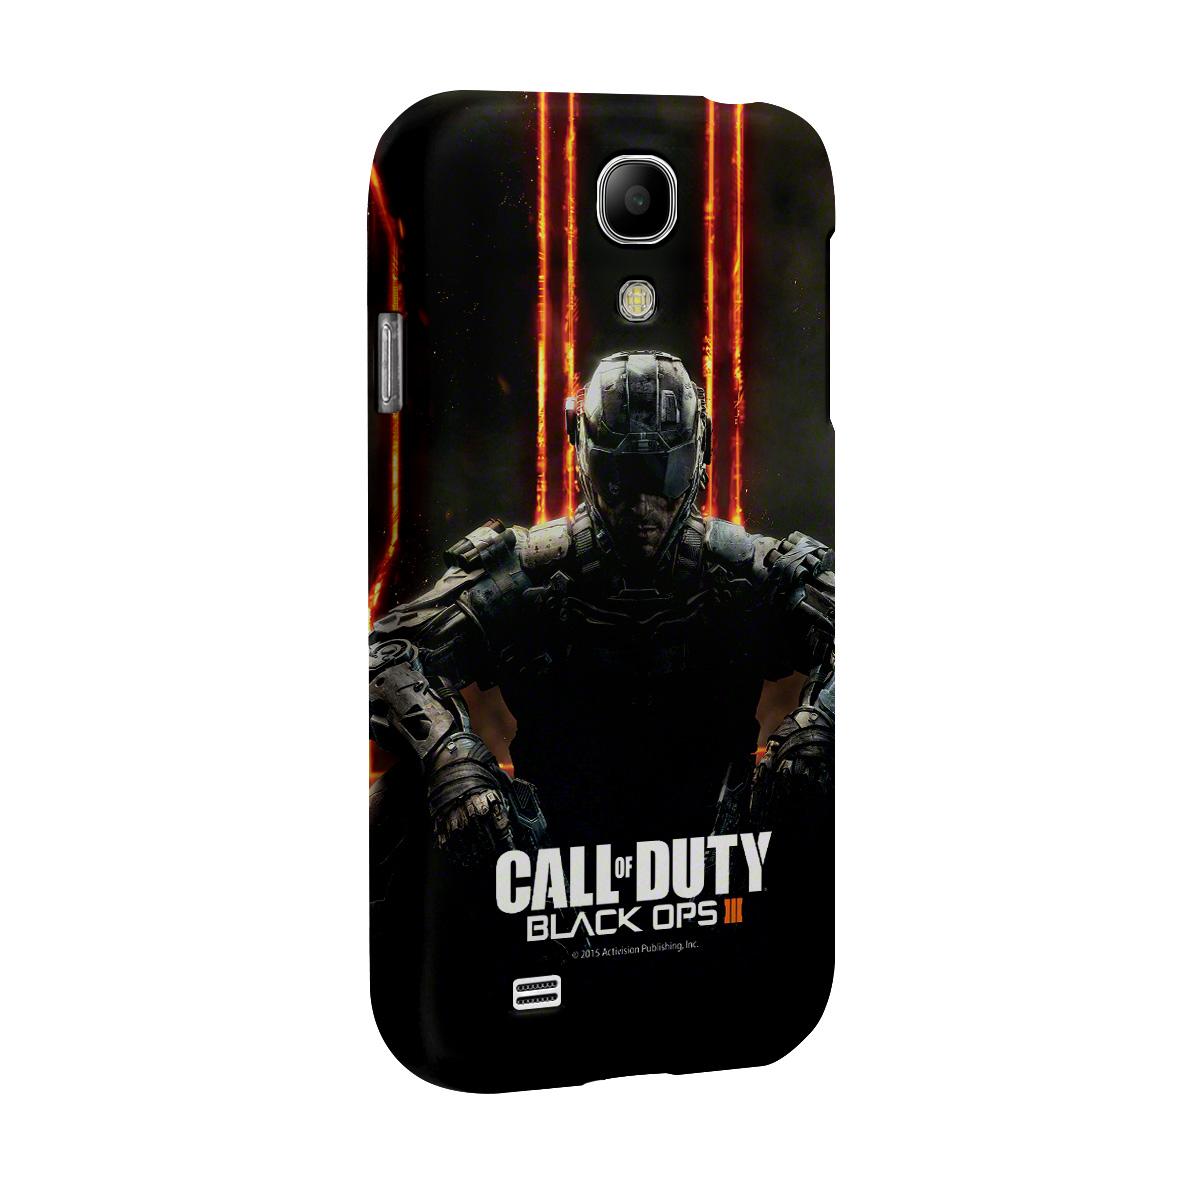 Capa para Galaxy S4 Call of Duty Soldier 2015